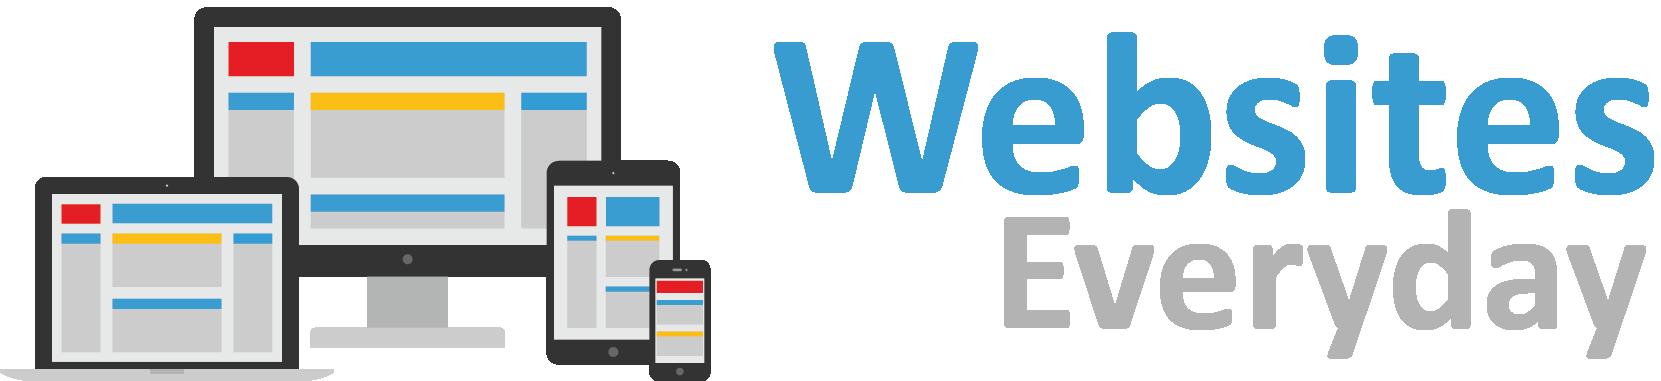 Websiteseveryday-Logo-with-Yellow2